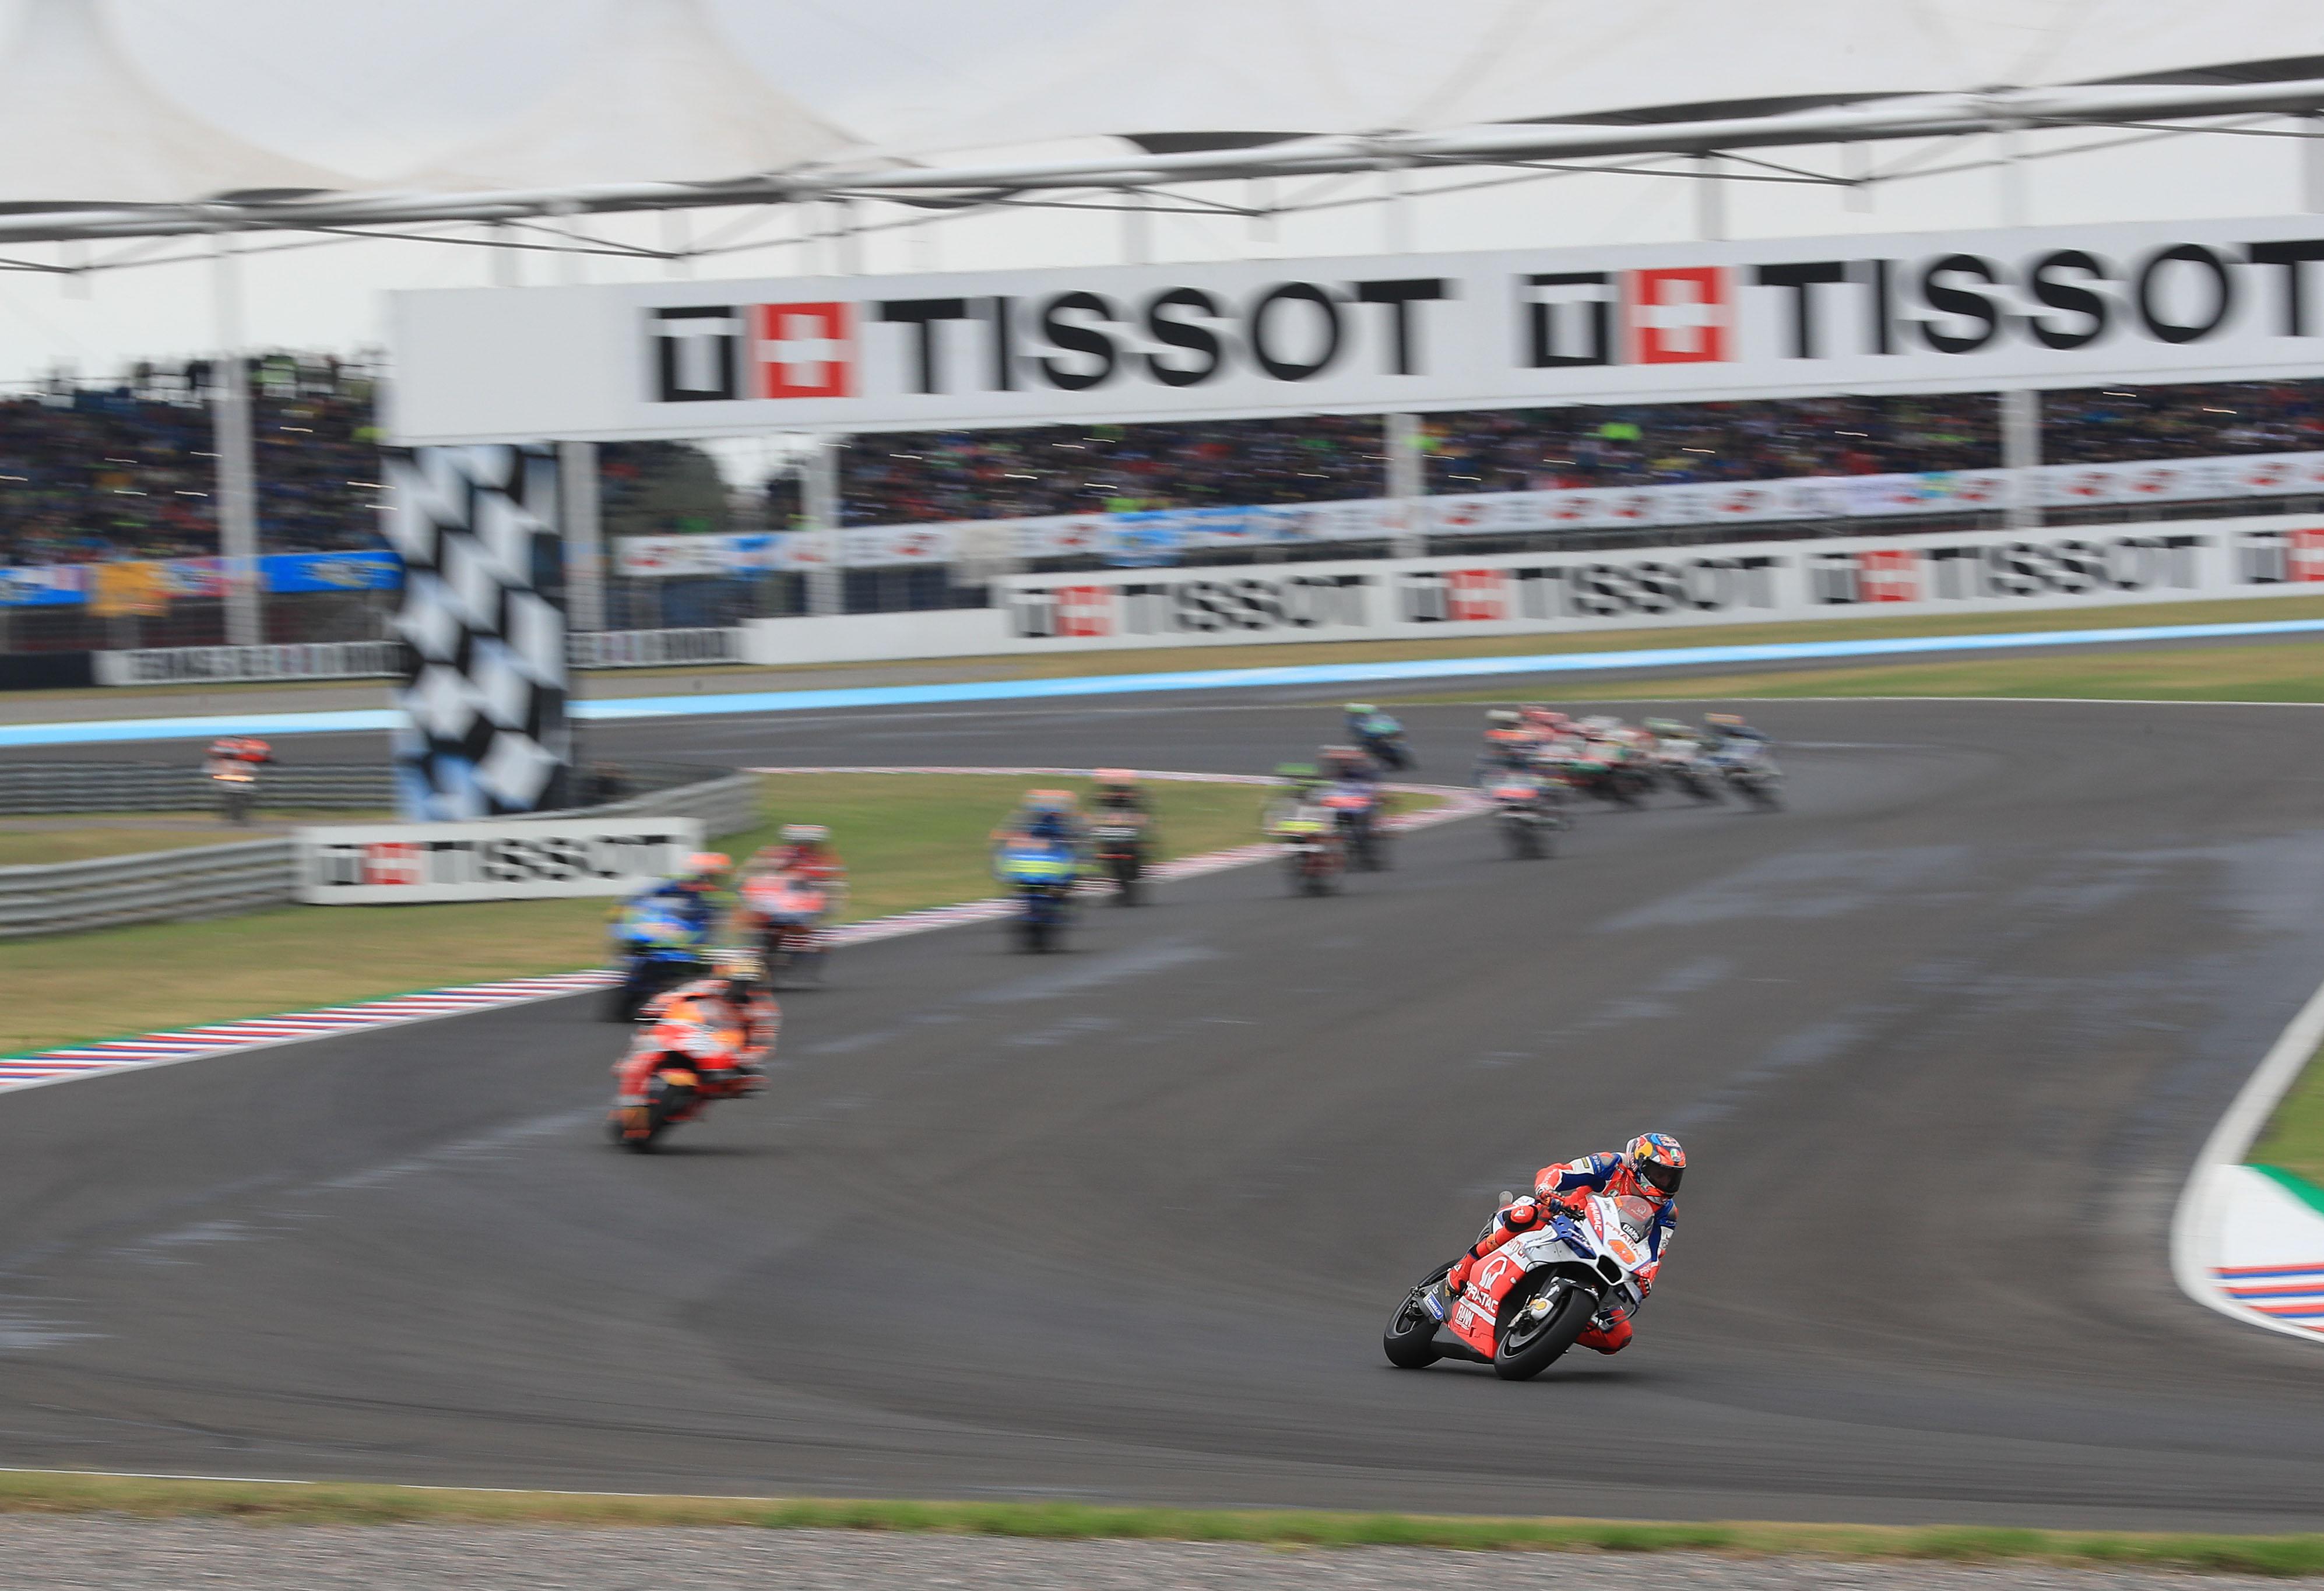 Jack Miller Pramac Ducati Argentina MotoGP 2018